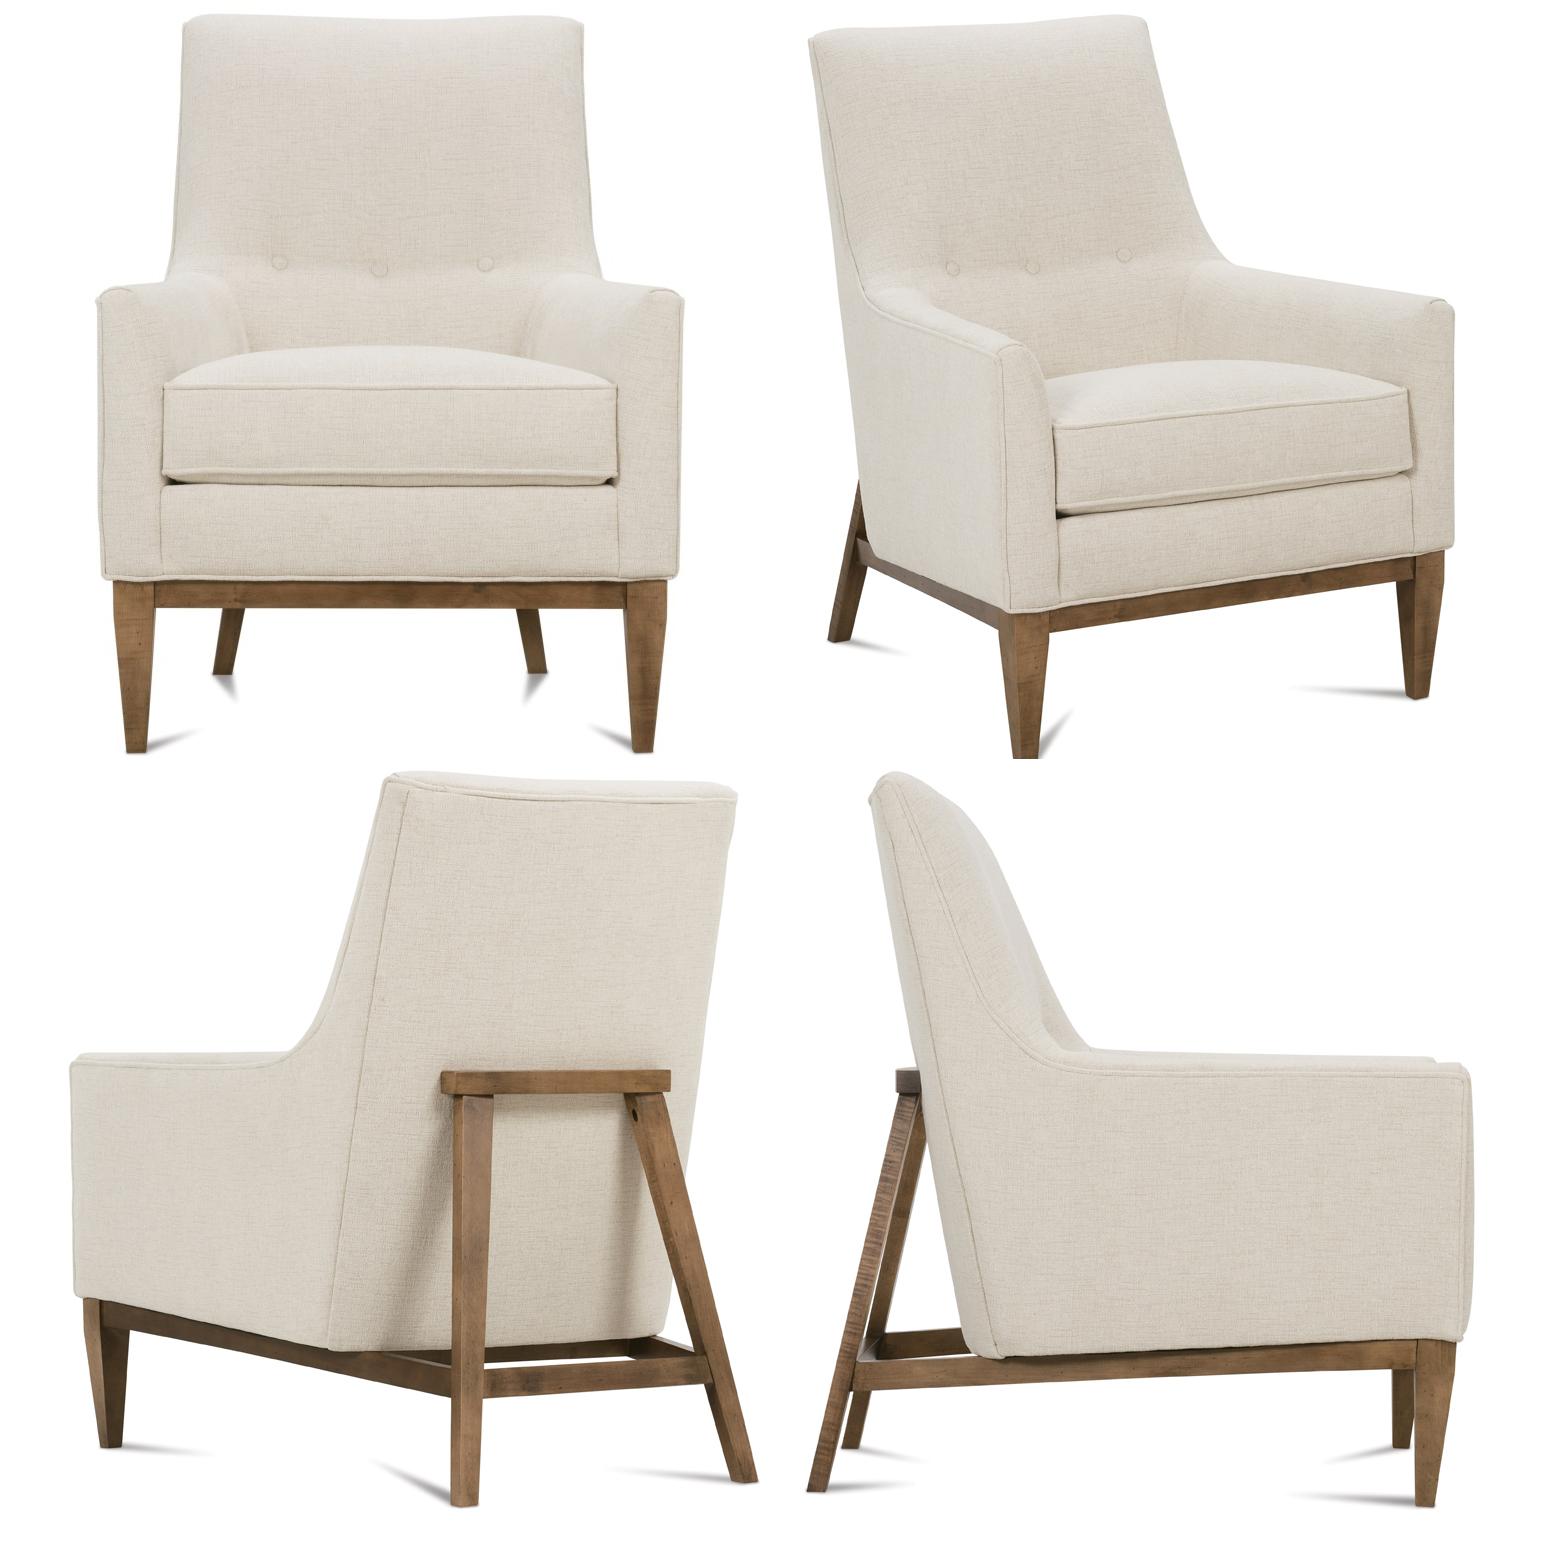 thatcher Chair.jpg